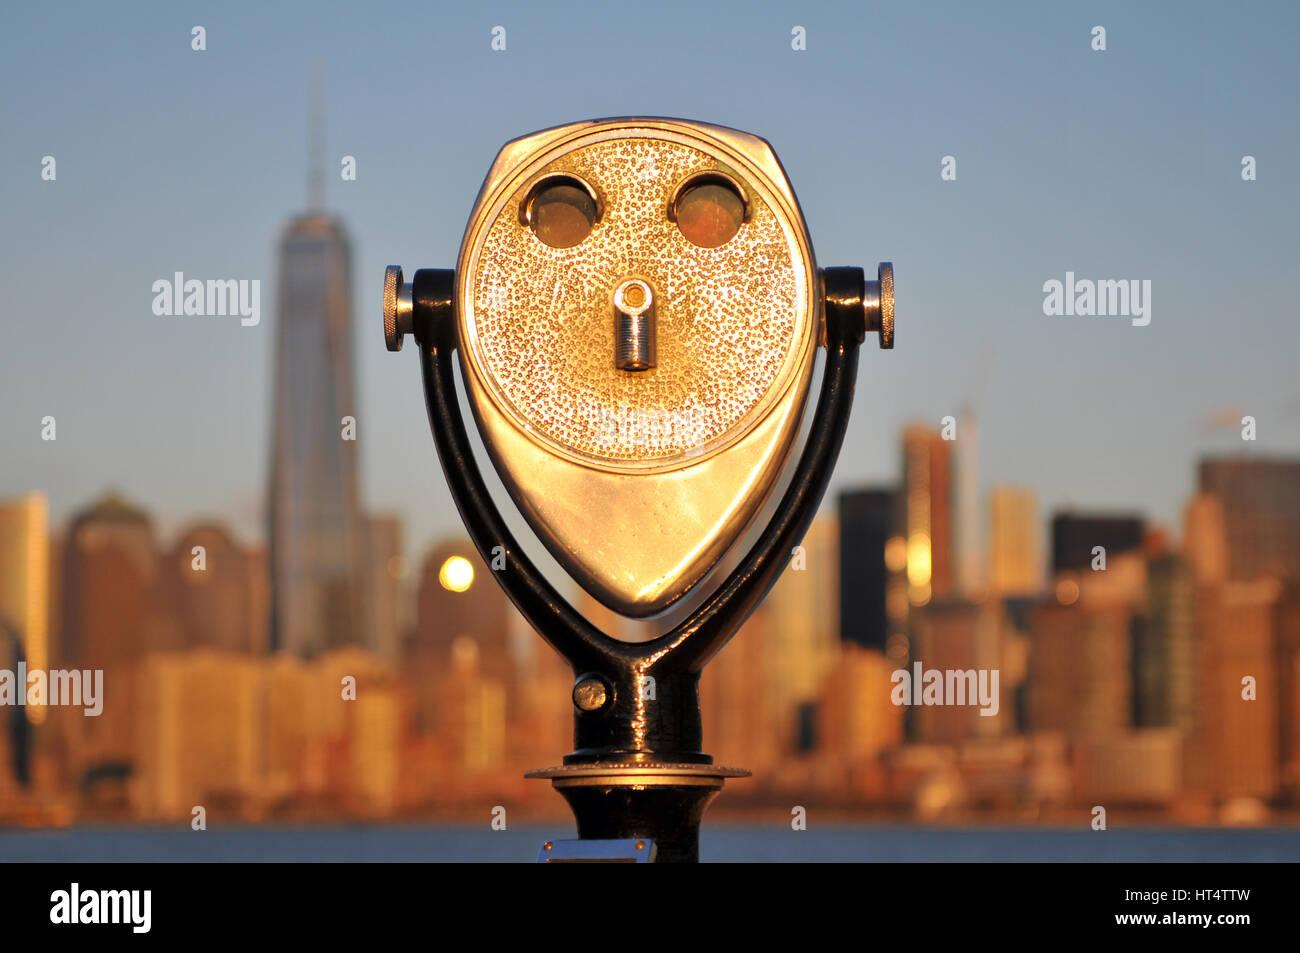 Binocular on Ellis Island in New York USA - Stock Image